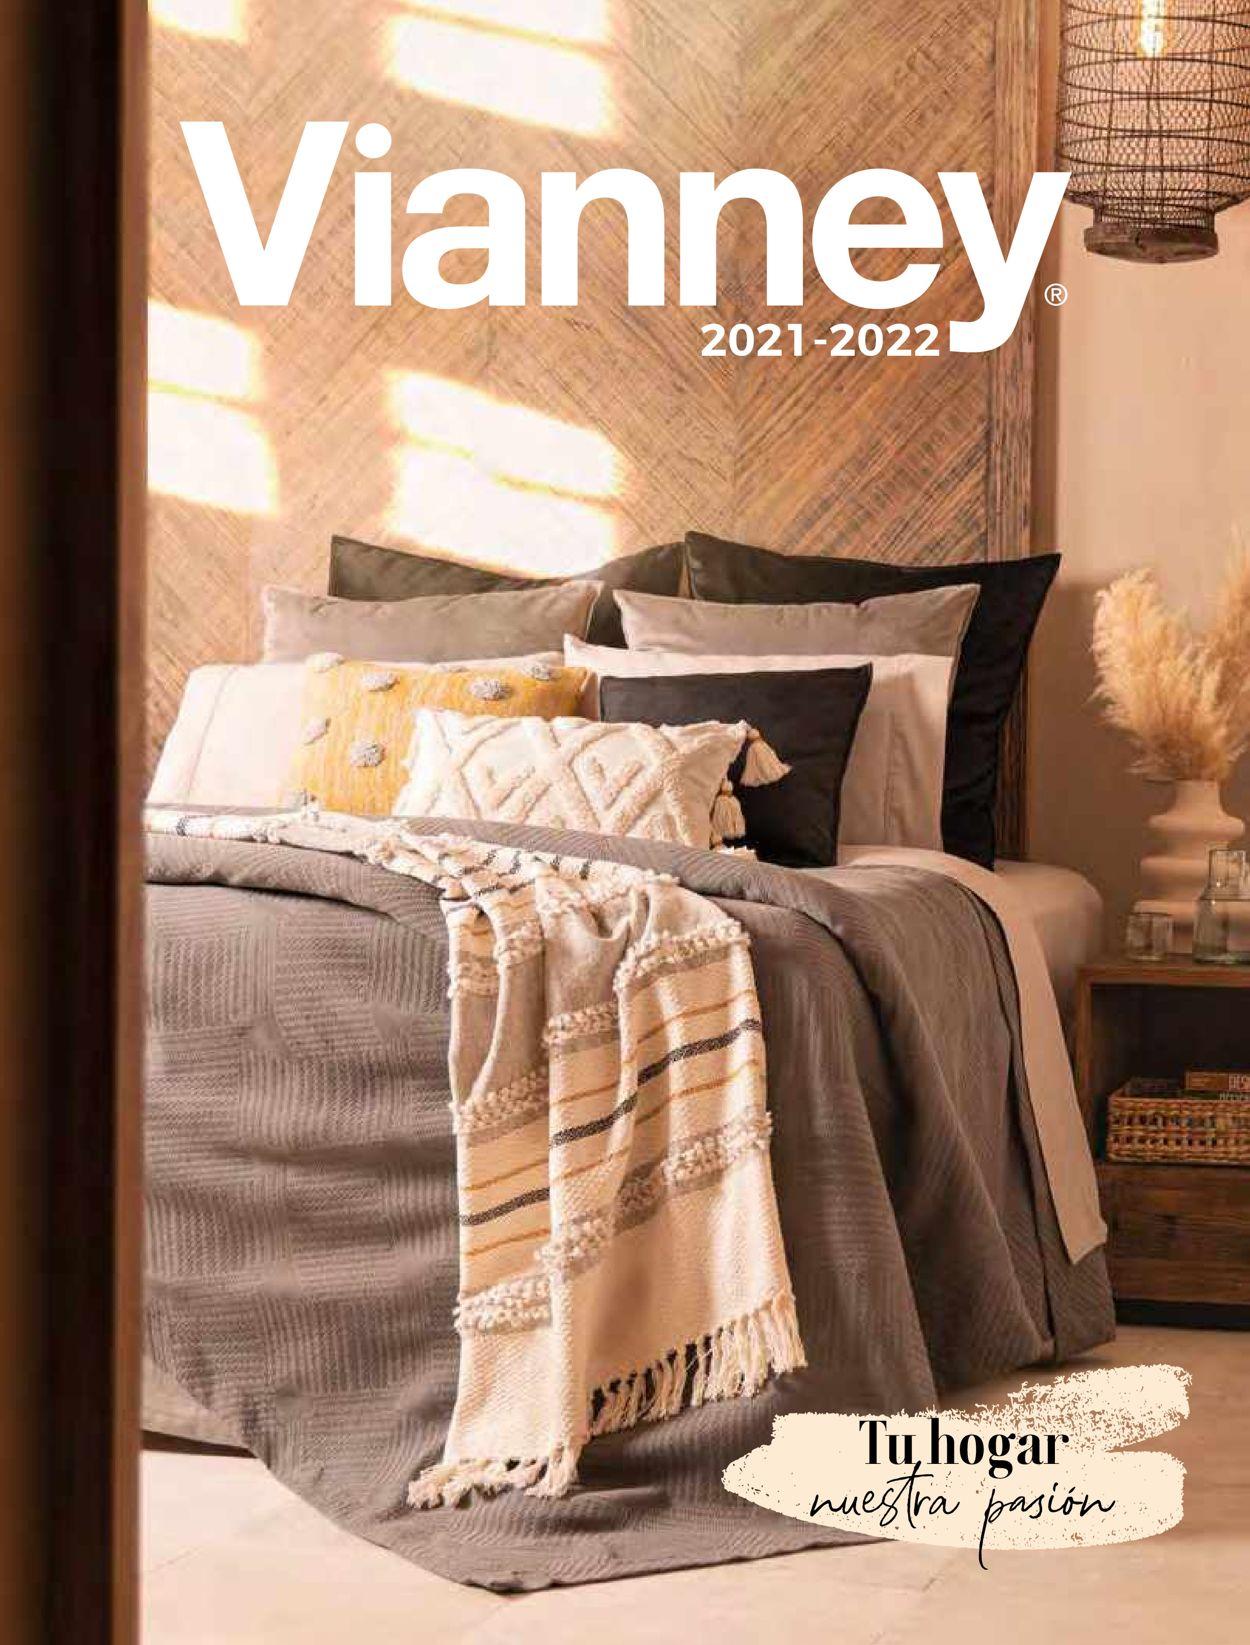 Vianney Folleto - 12.03-28.02.2022